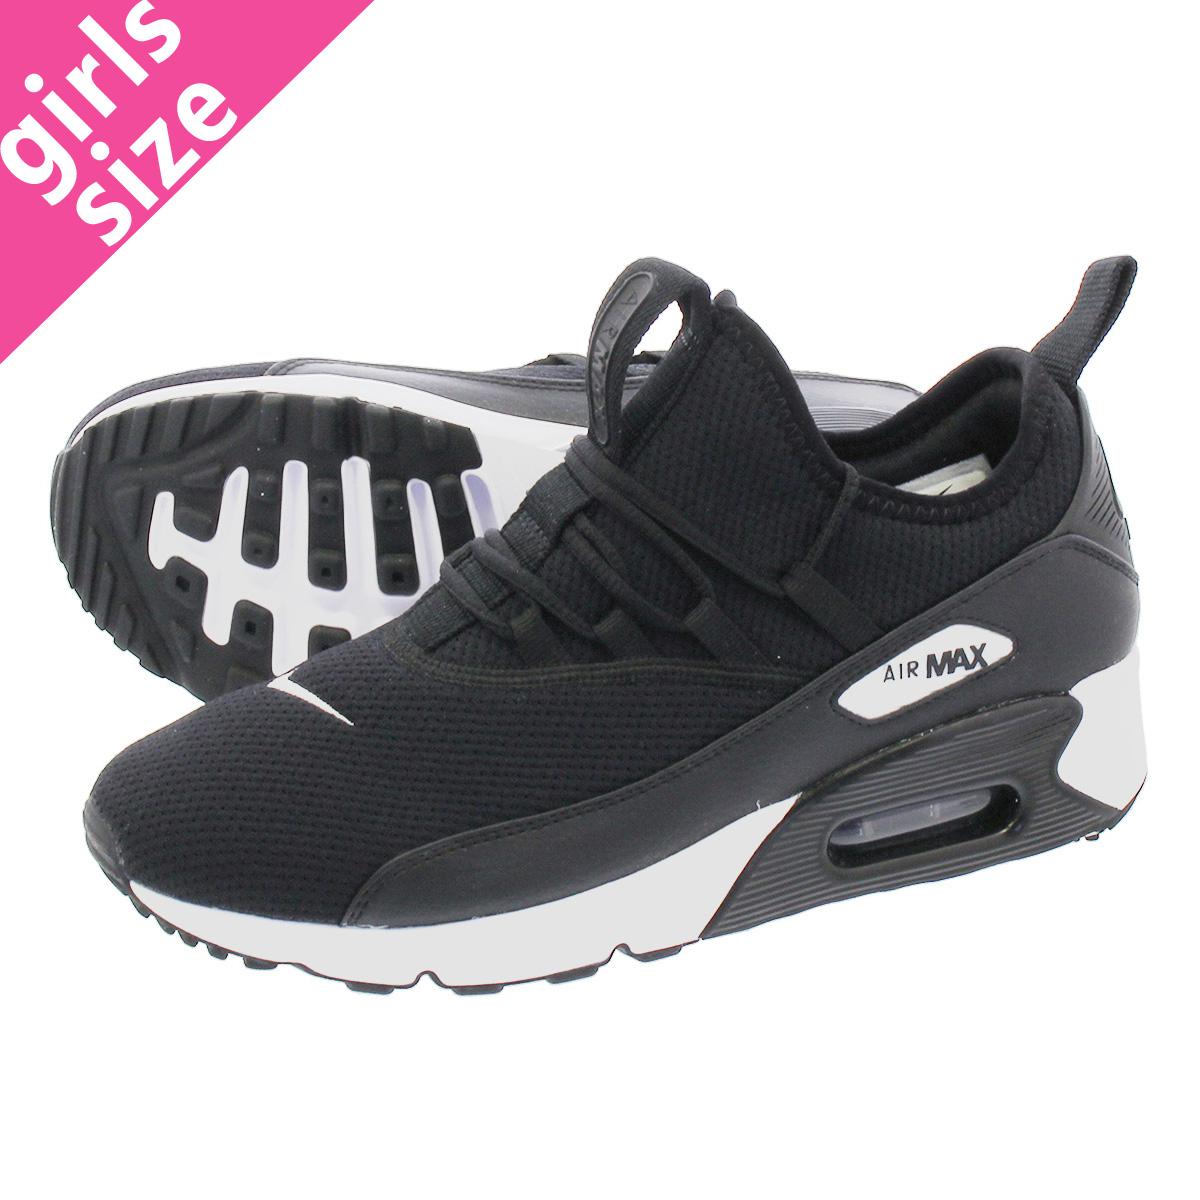 frenz2: Nike Air Max 90 EZ Camo Kie Ney AMAX 90 black AV7900